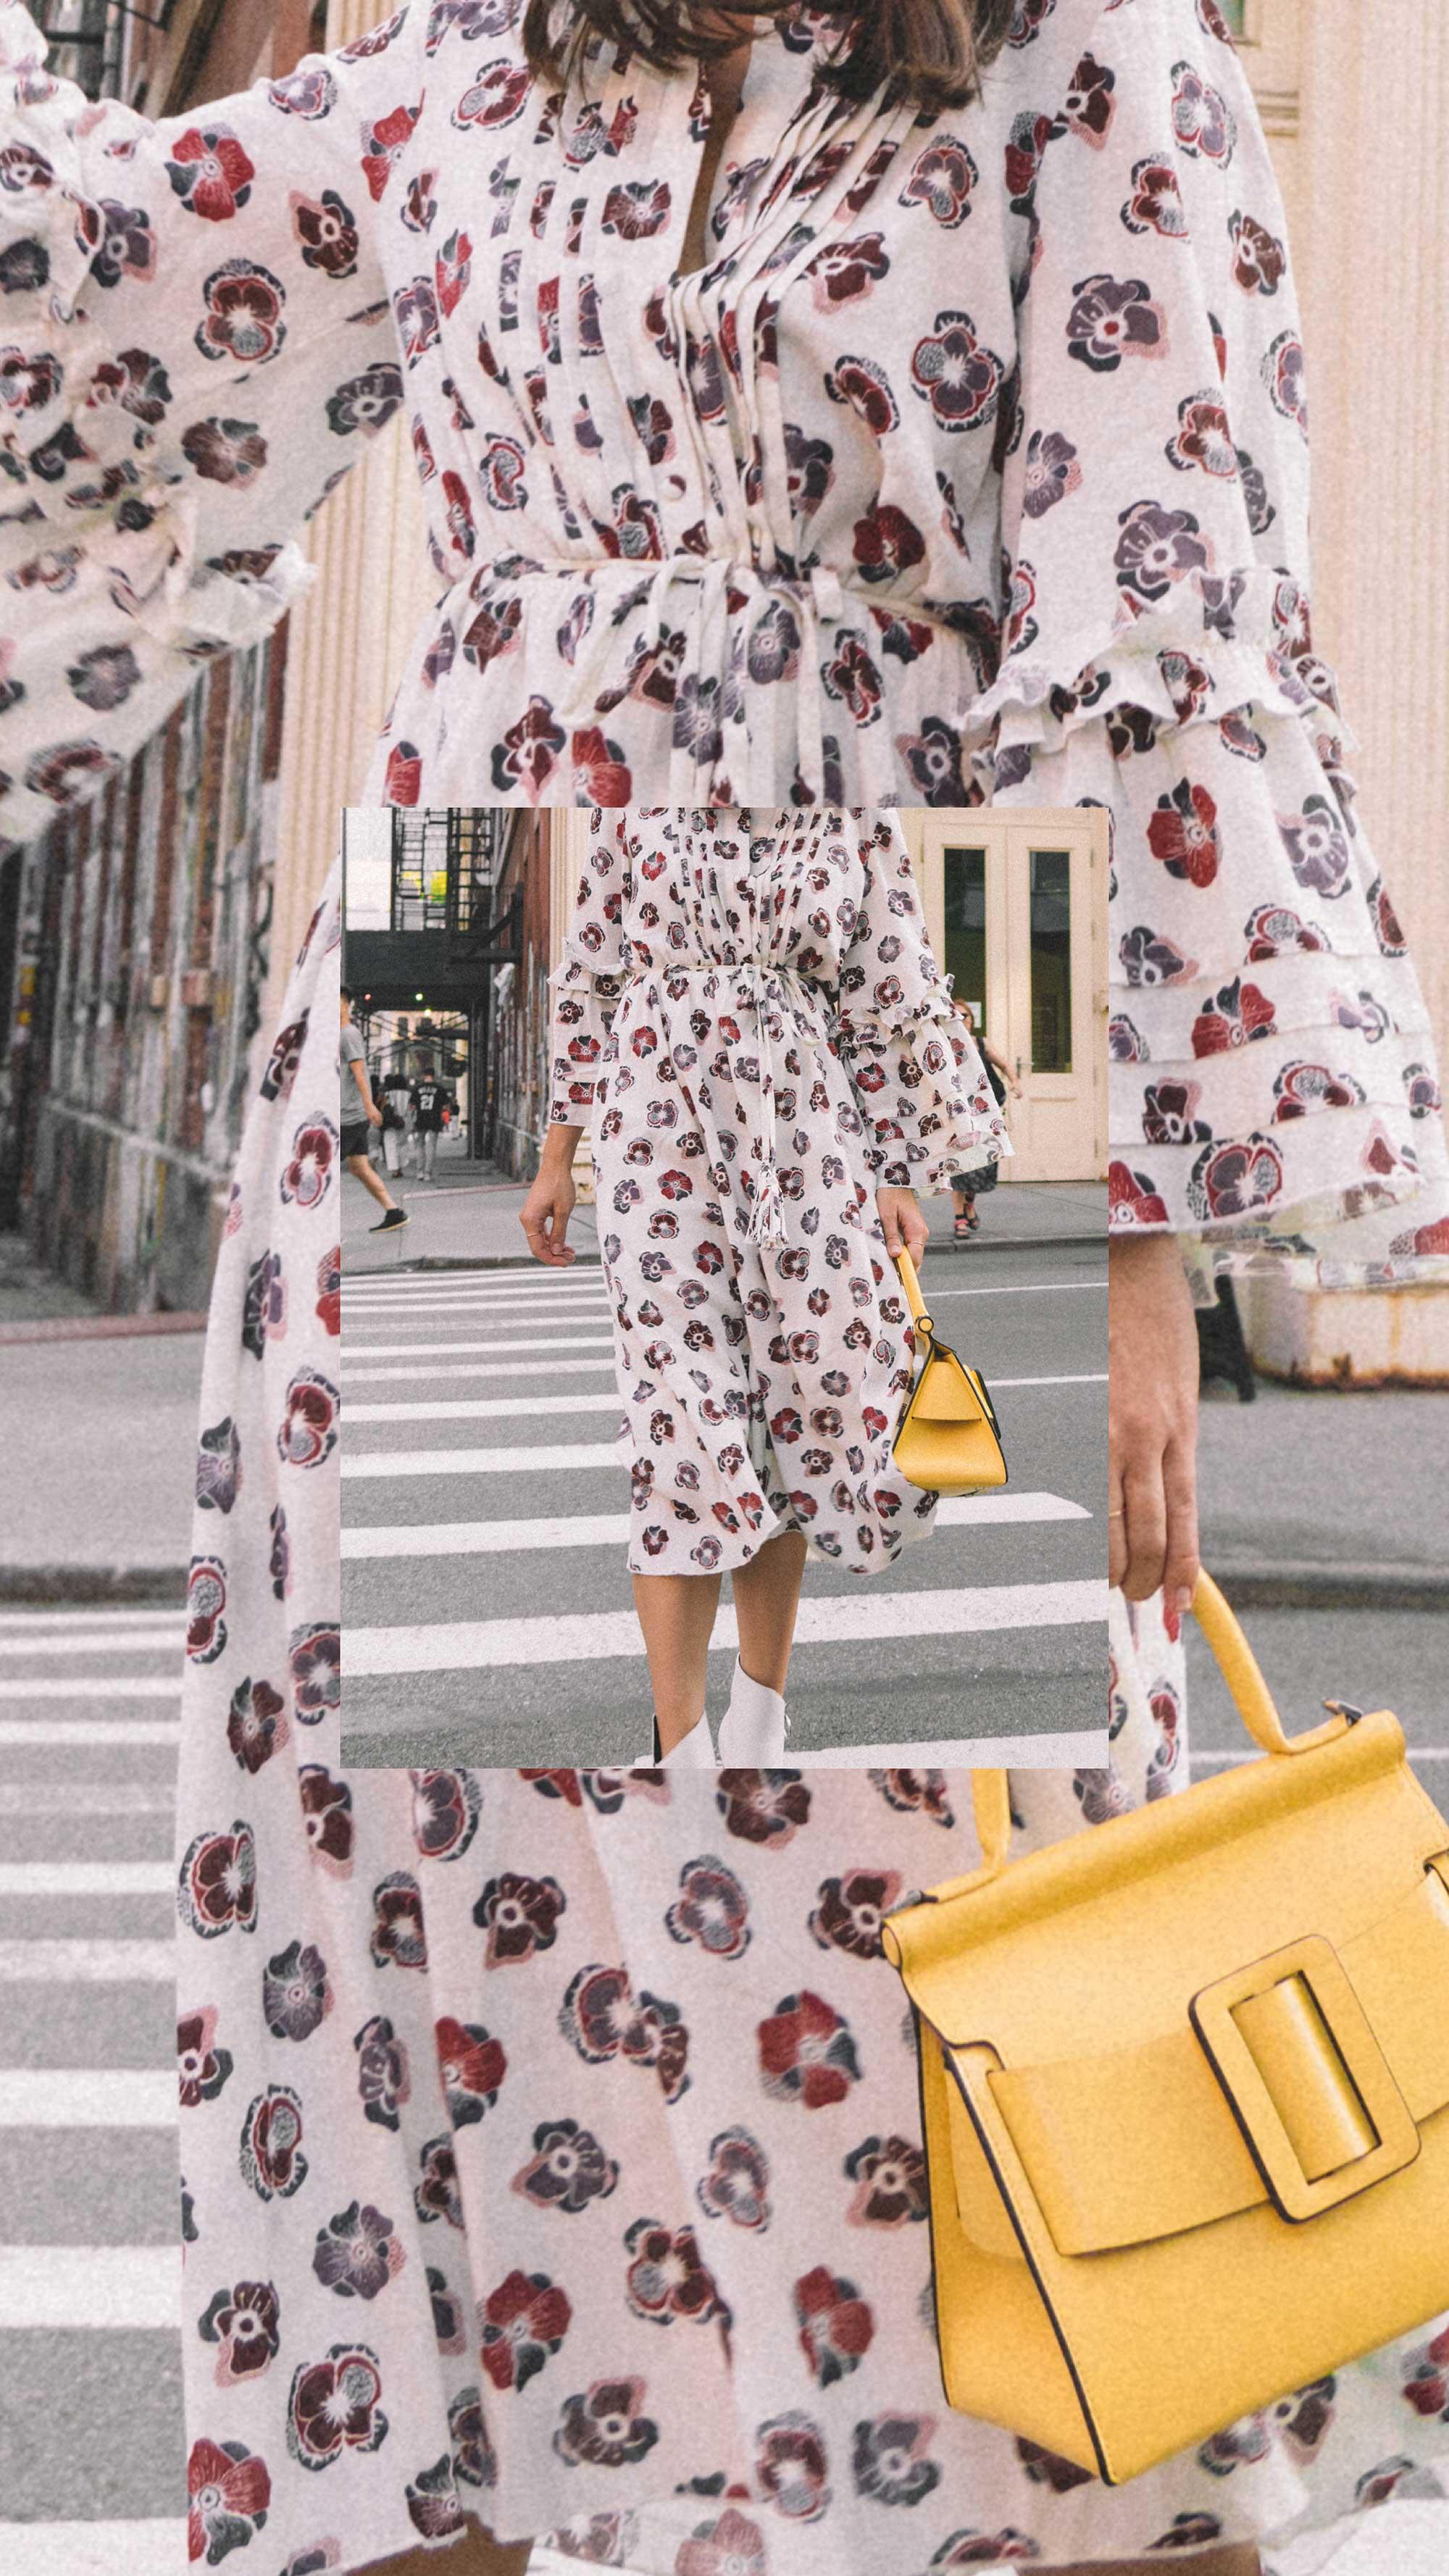 Madewell x Karen Walker Floral Fantasia Ruffled Dress and BOYY Karl 24 Bag soho new york fashion week outfit10.jpg